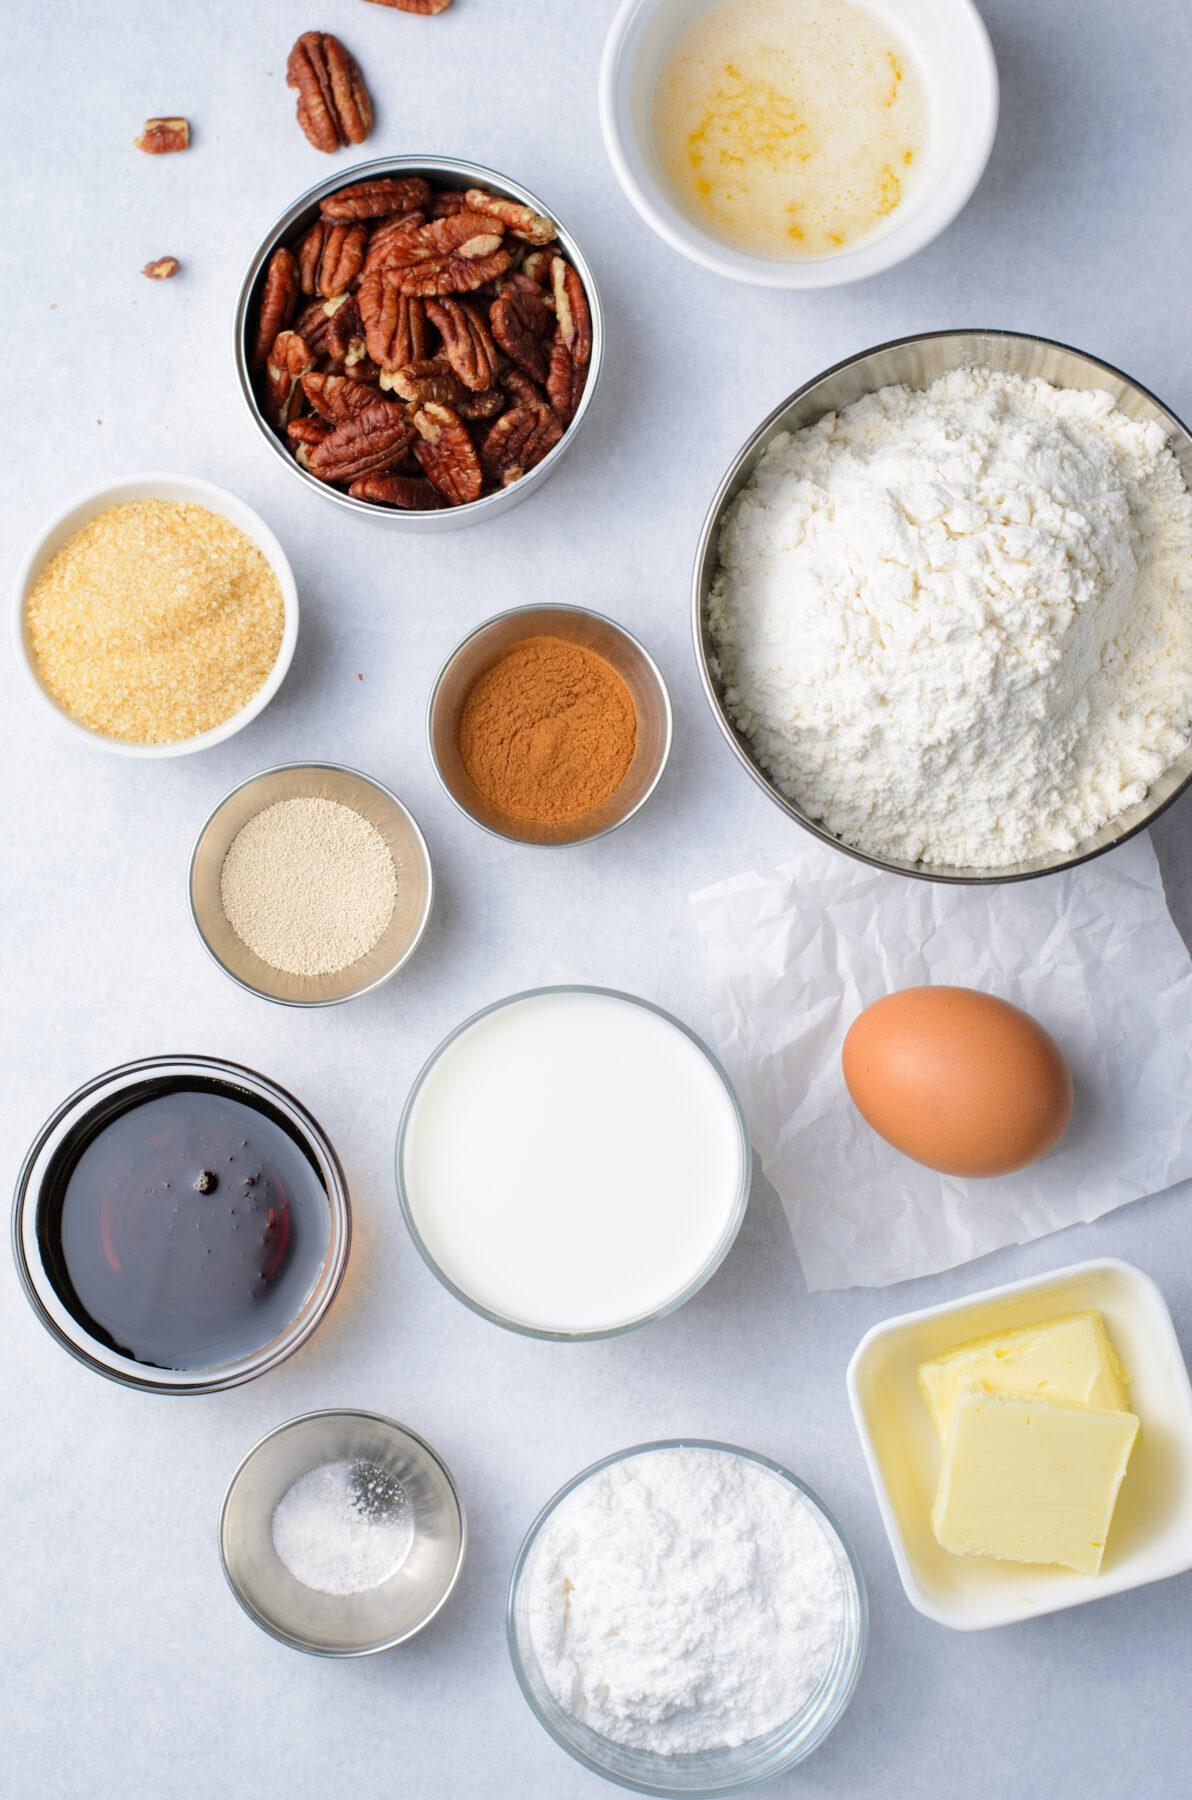 Ingredients for maple pecan bread.